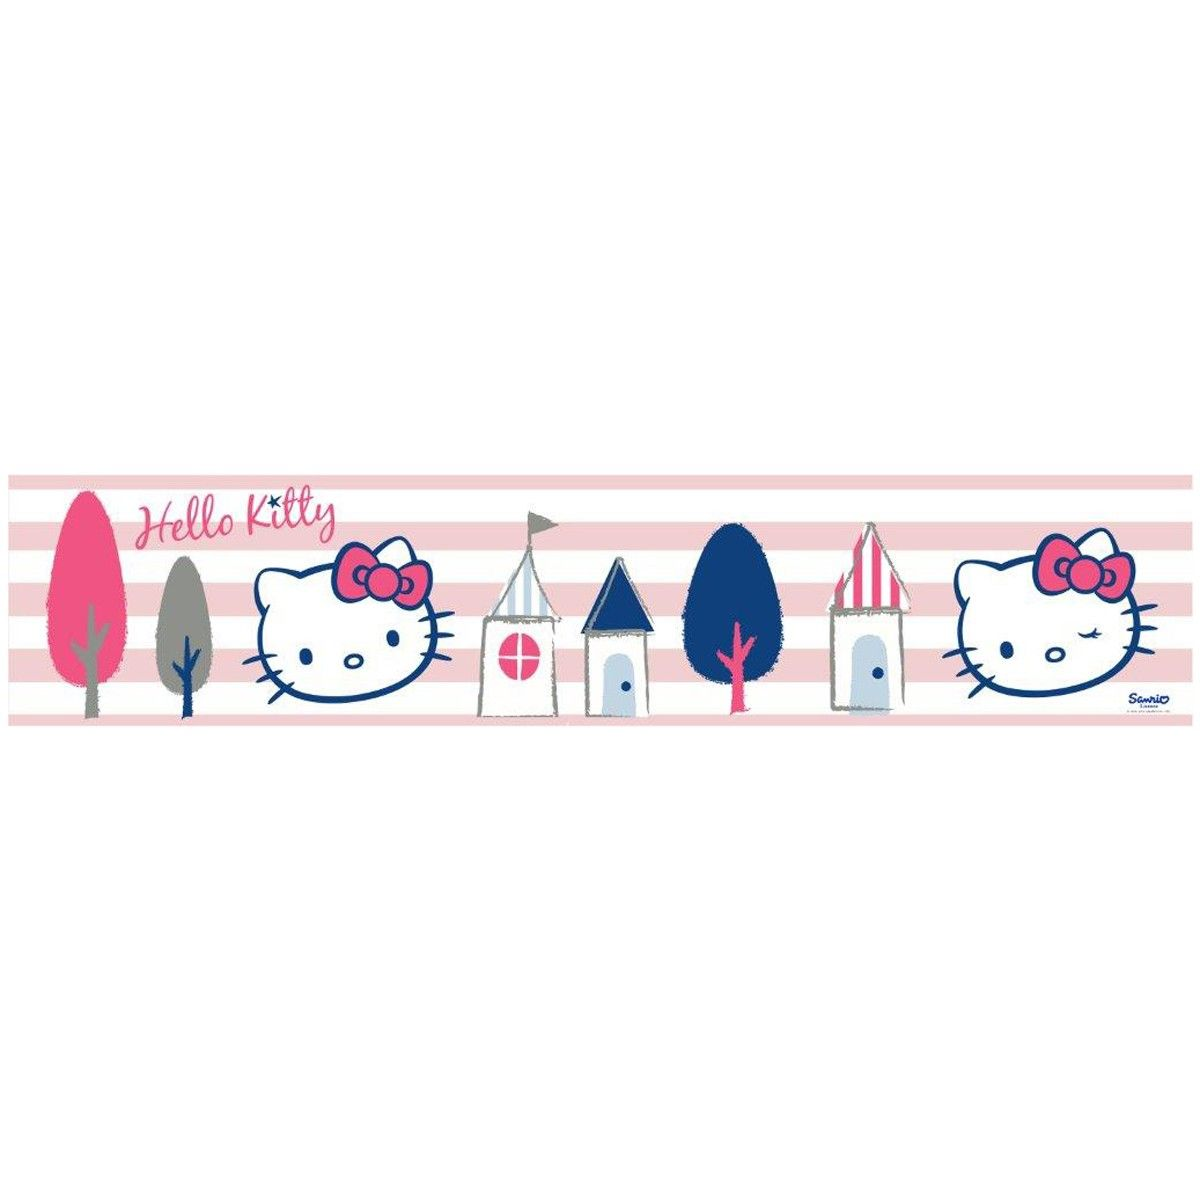 Hello Kitty Pink And White Stripe Self Adhesive Wallpaper Border 5m Self Adhesive Wallpaper Borders Wallpaper Border Self Adhesive Wallpaper